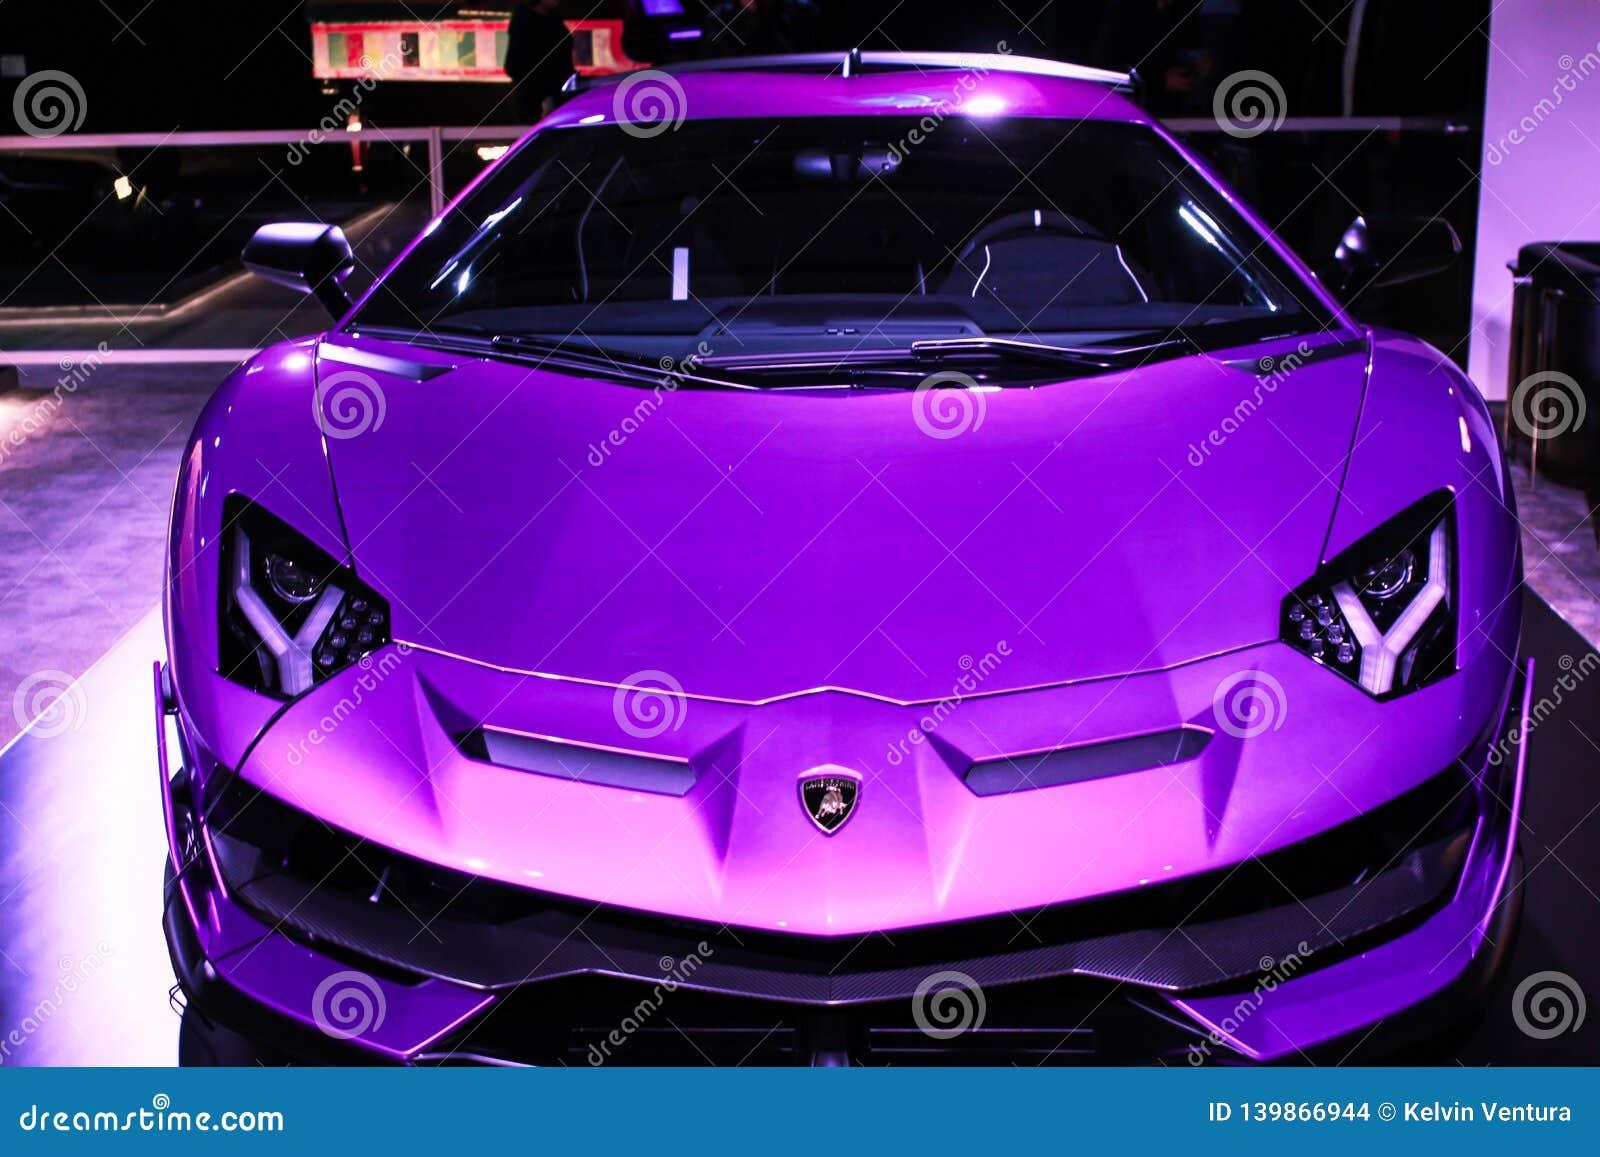 Rare Purple Lamborghini On Display Editorial Stock Image Image Of